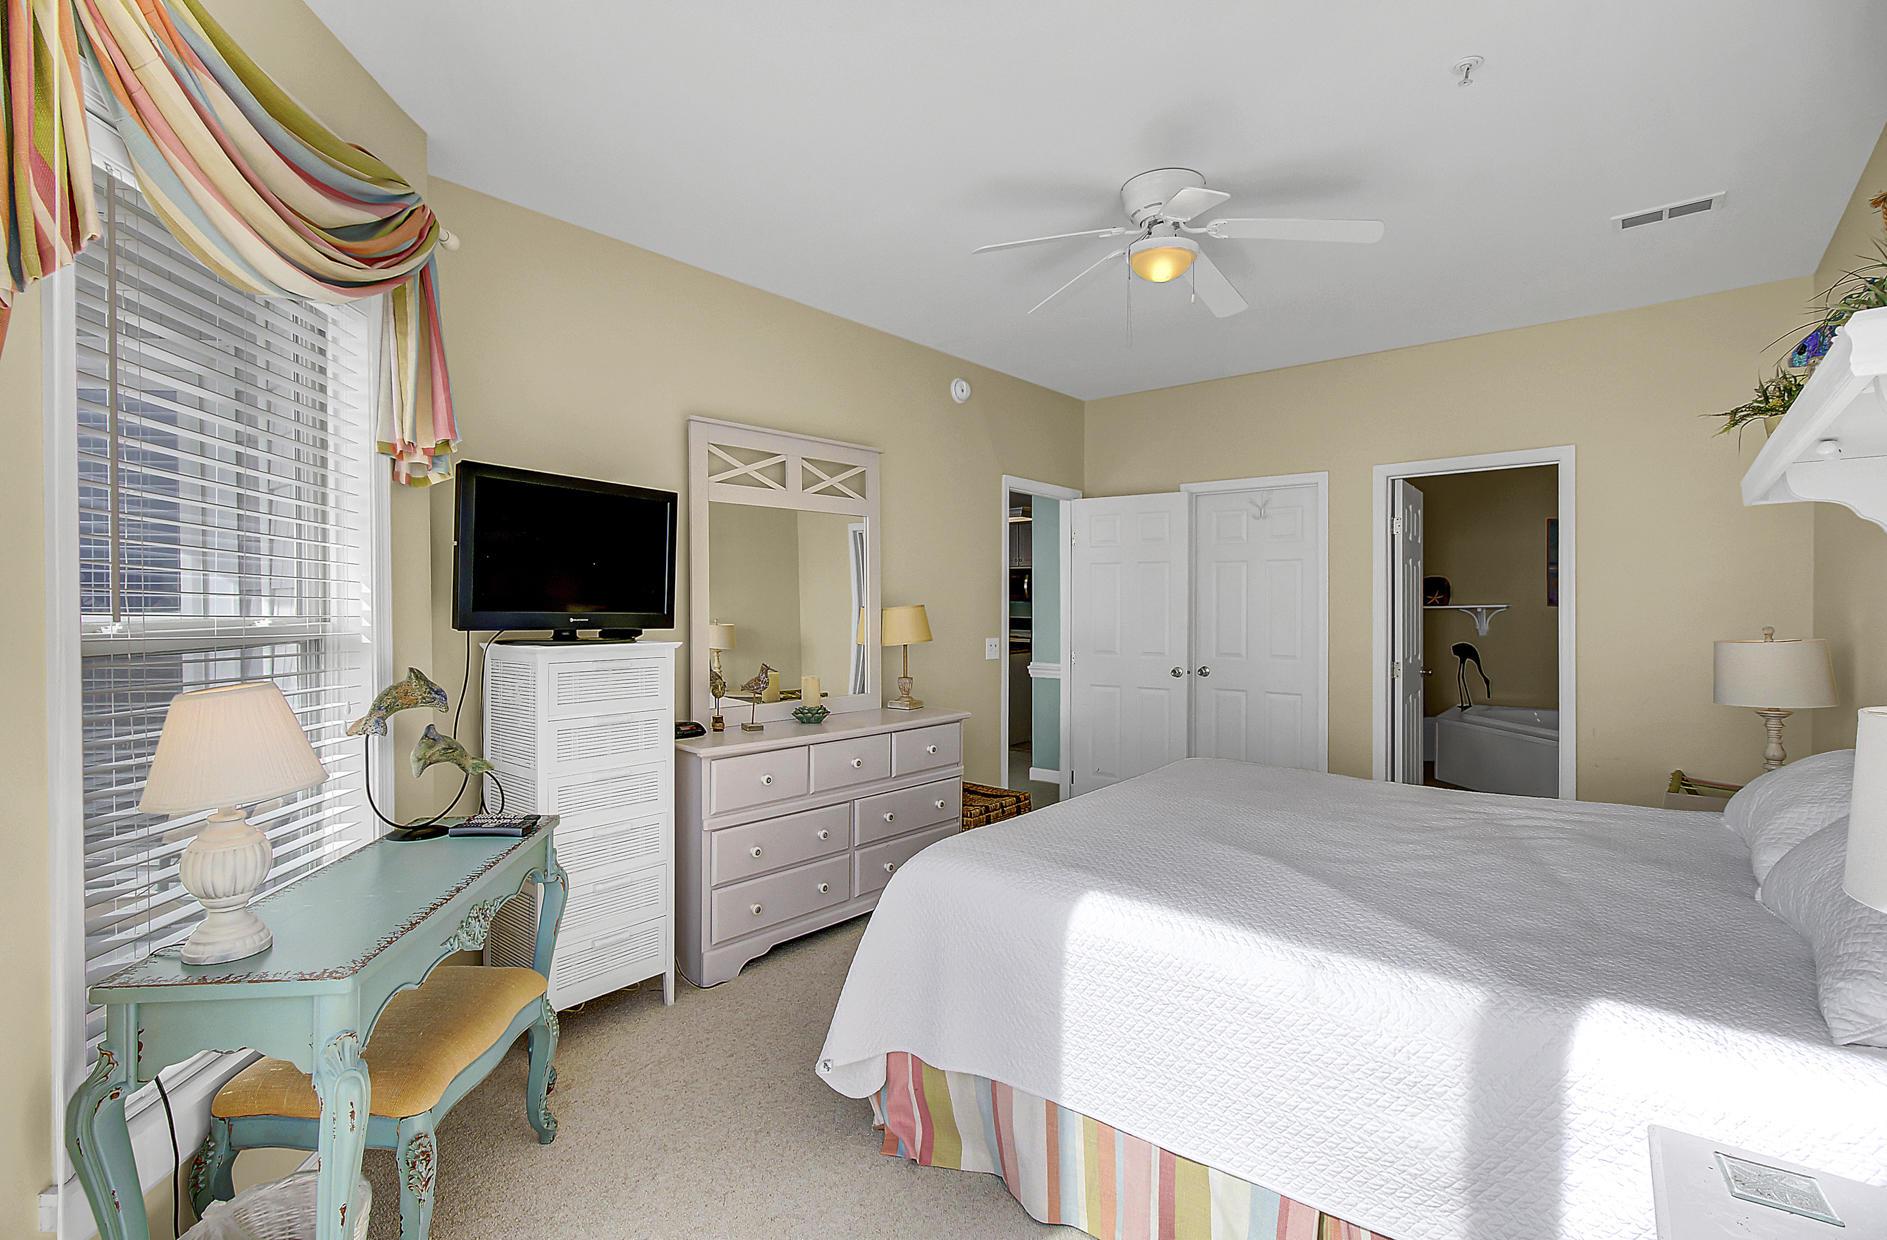 Seaside Villas I Homes For Sale - 111 Arctic, Folly Beach, SC - 29